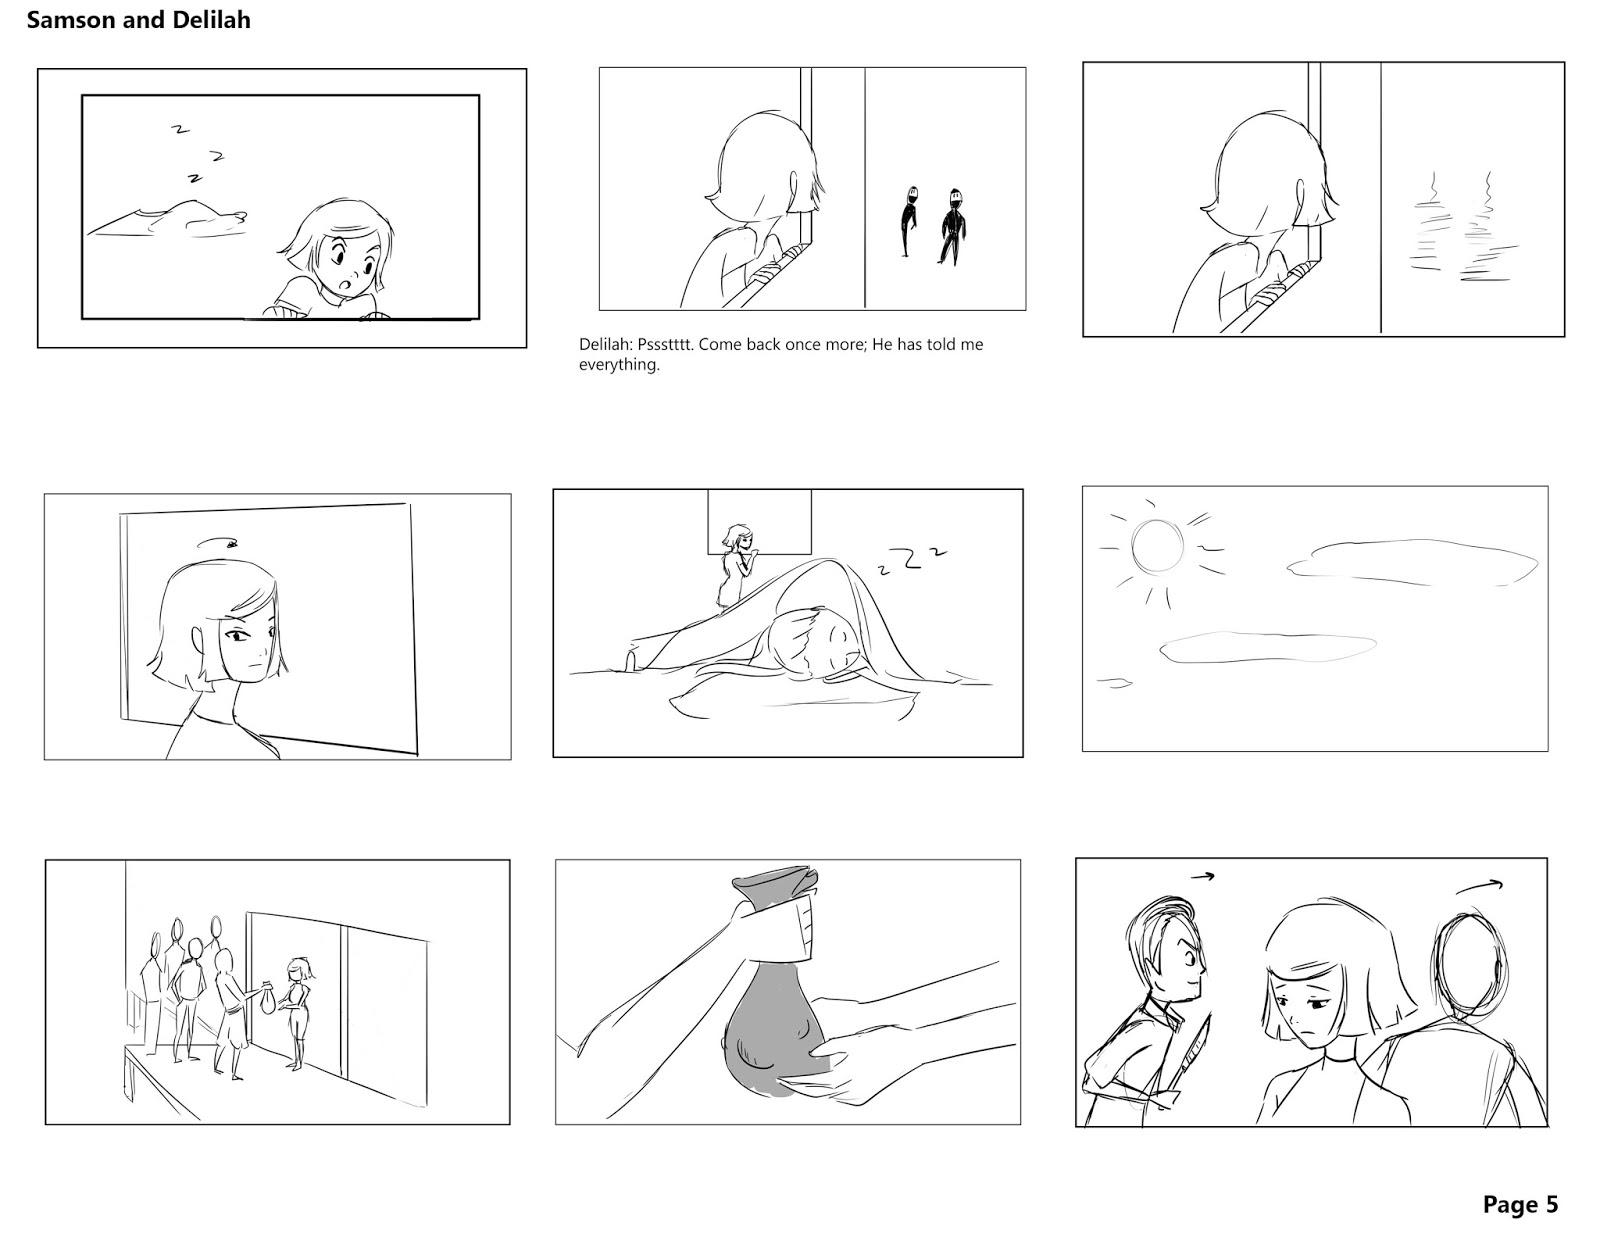 Diana Doung S Storyboard Portfolio Samson And Delilah